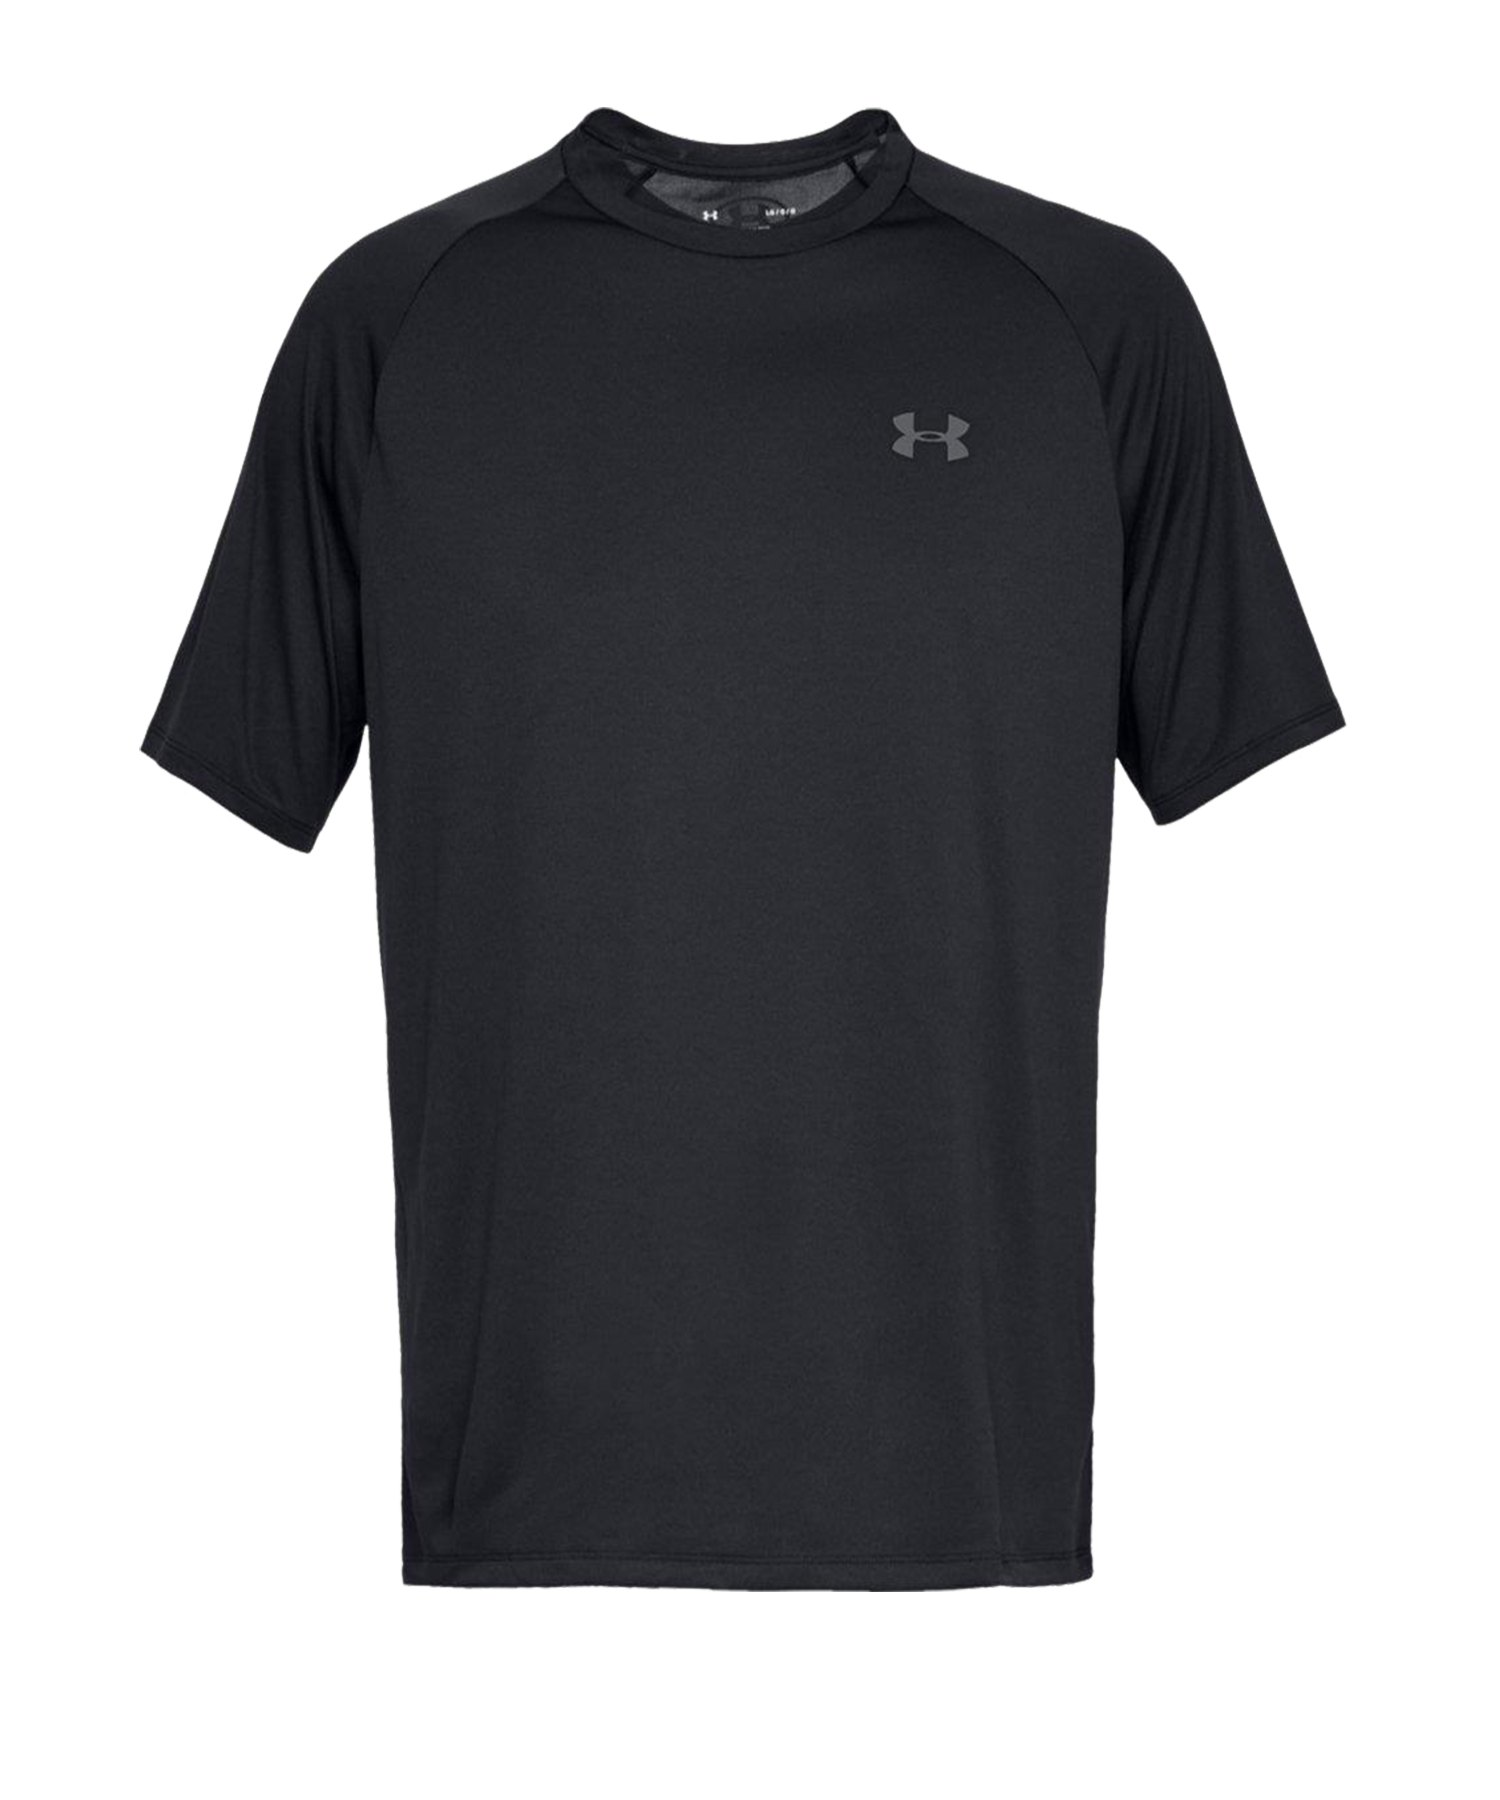 Under Armour Tech T-Shirt Schwarz F001 - schwarz